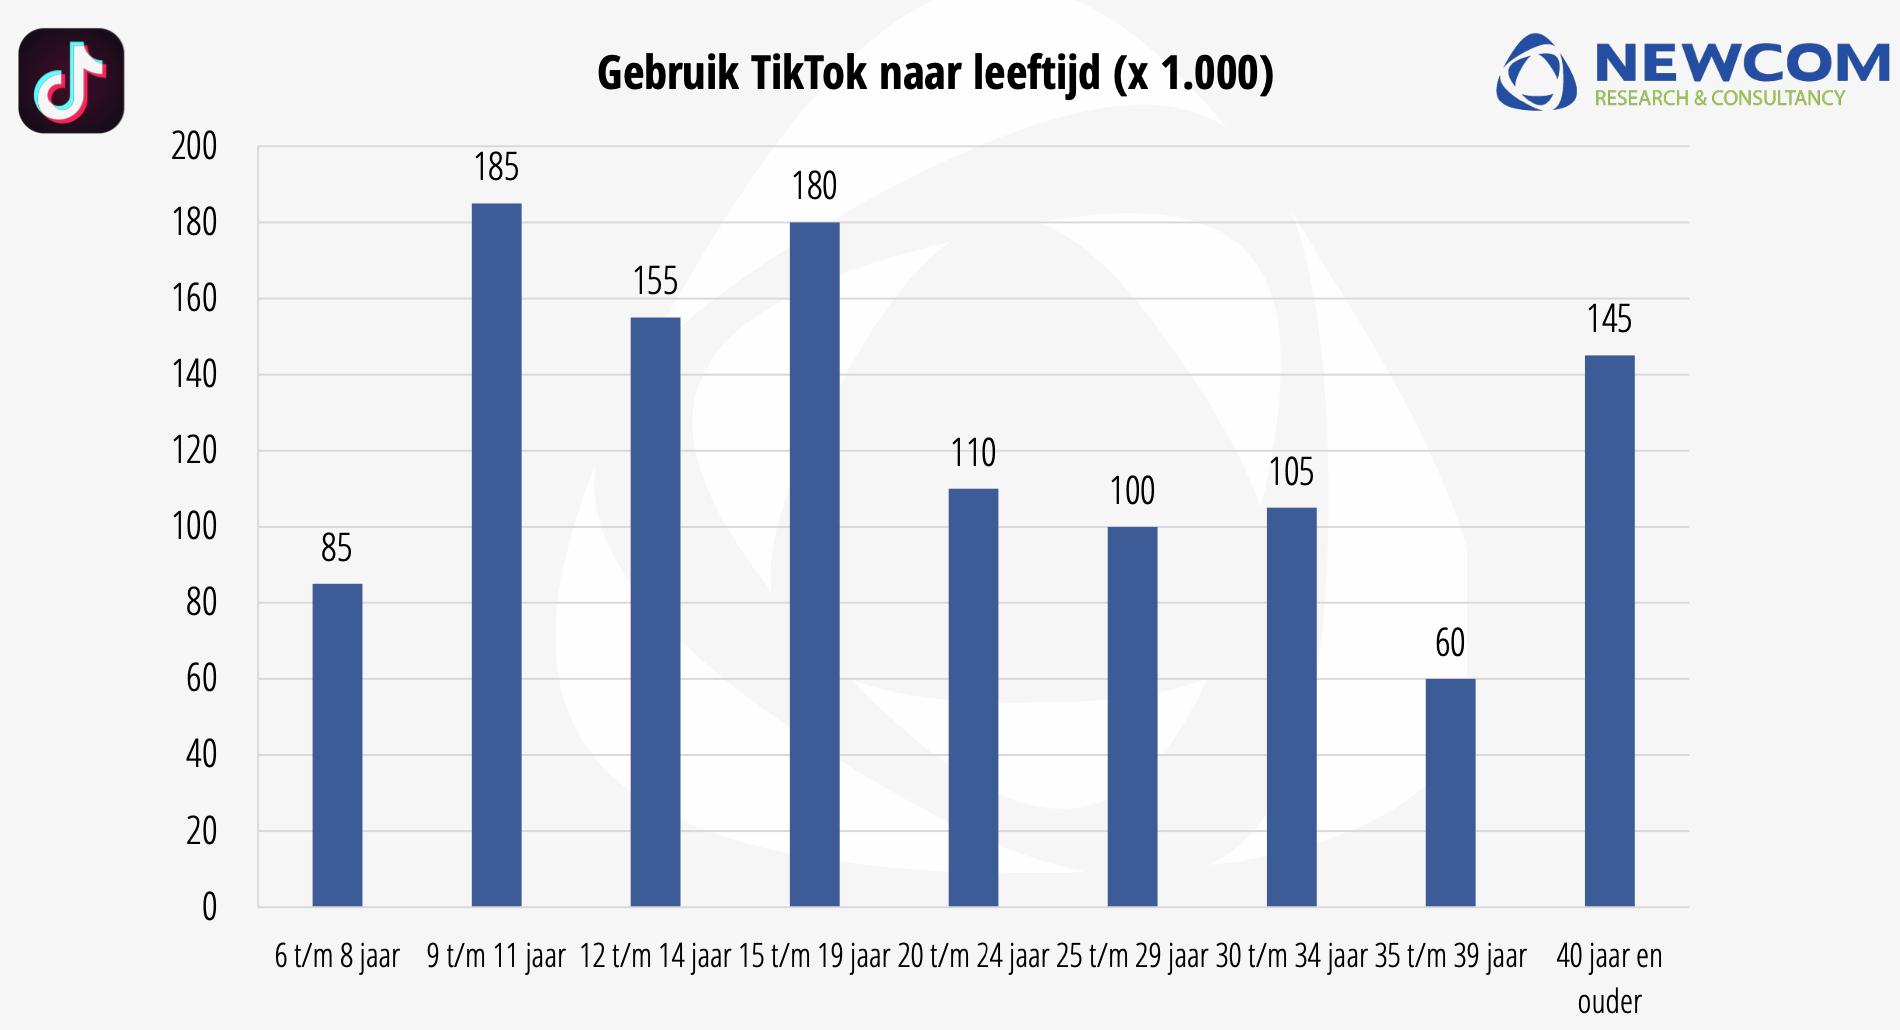 Newcom Gebruik van TikTok Nederland 2020